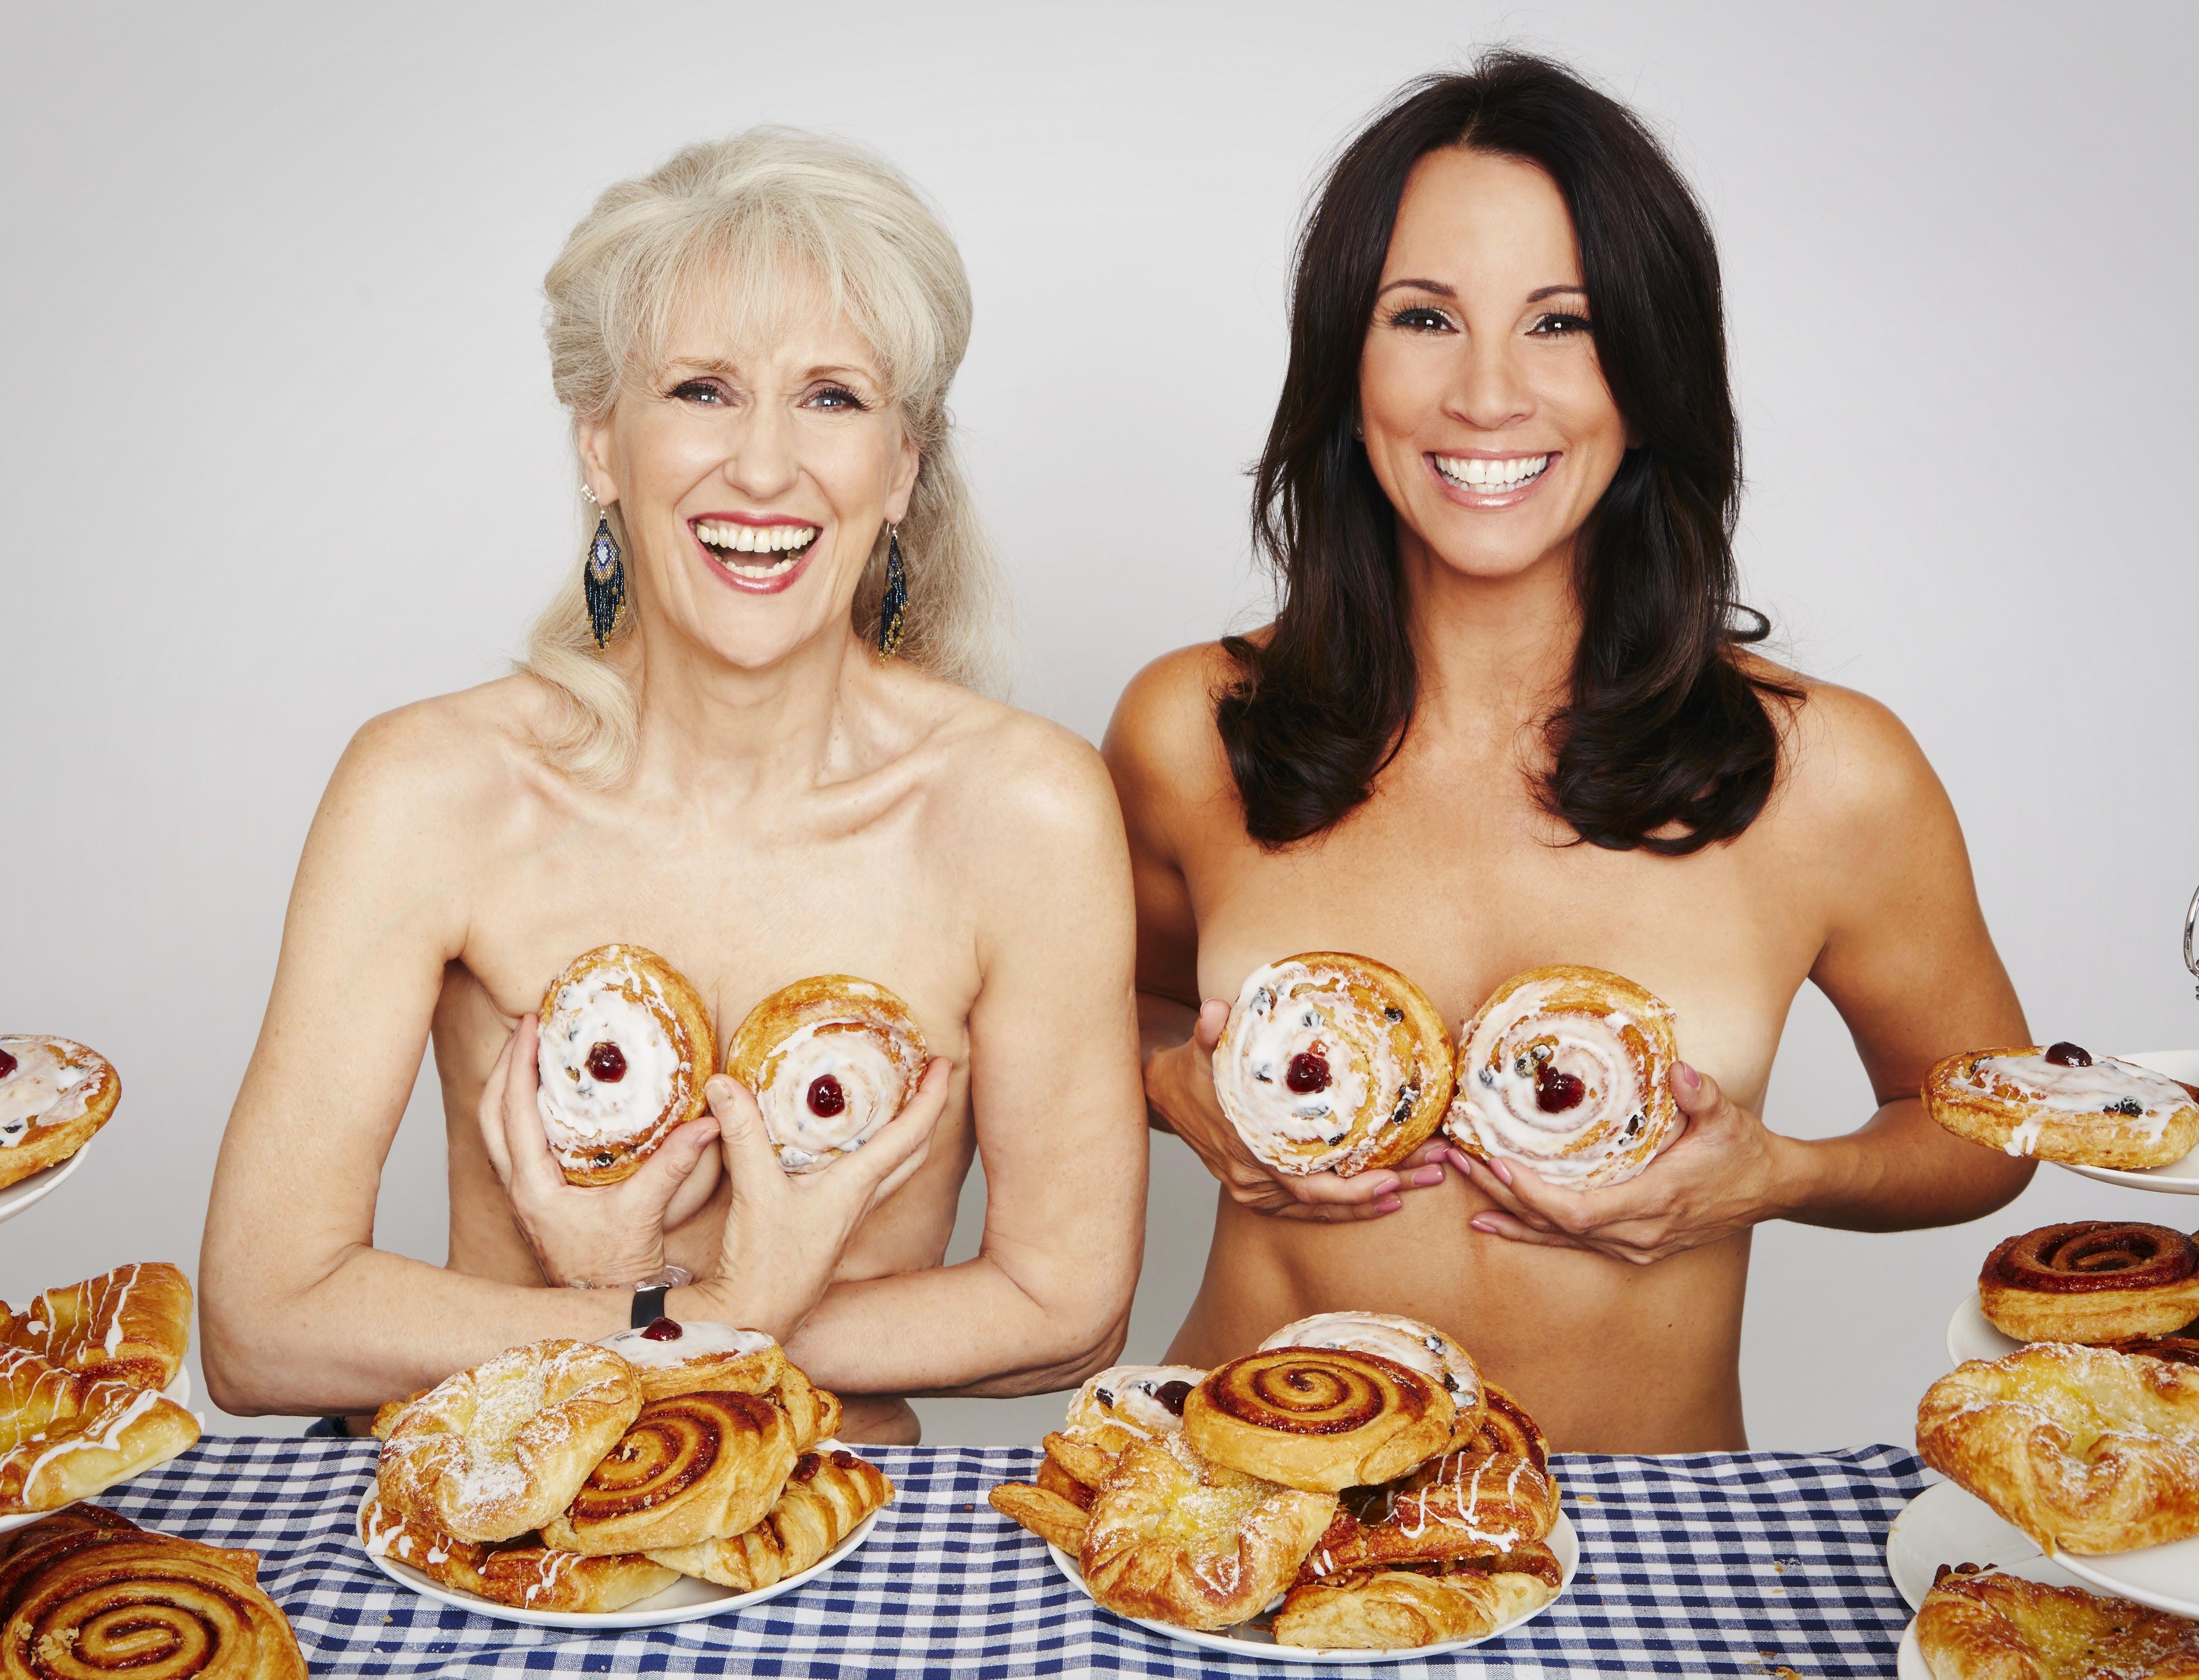 Andrea Mclean Topless loose women go topless as calendar girls